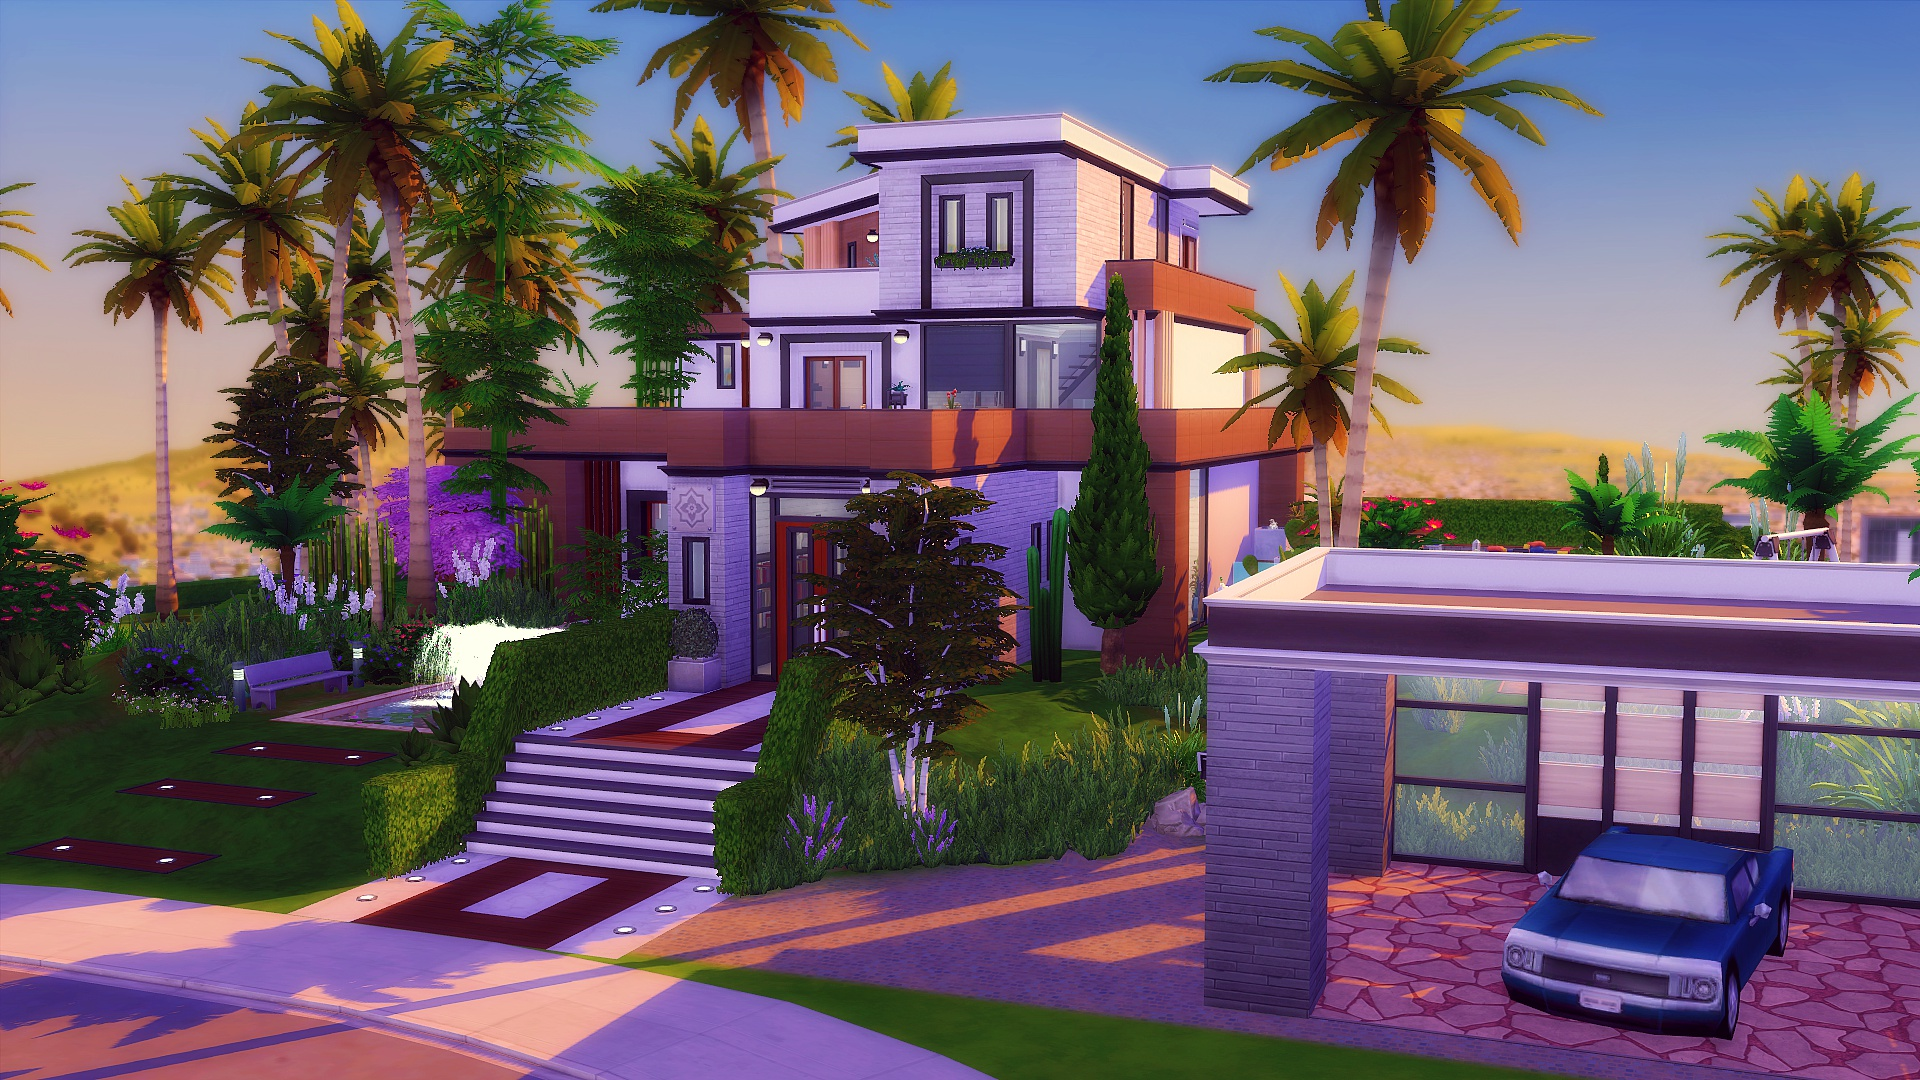 Maison Moderne Sims 4 Studiosims Creation